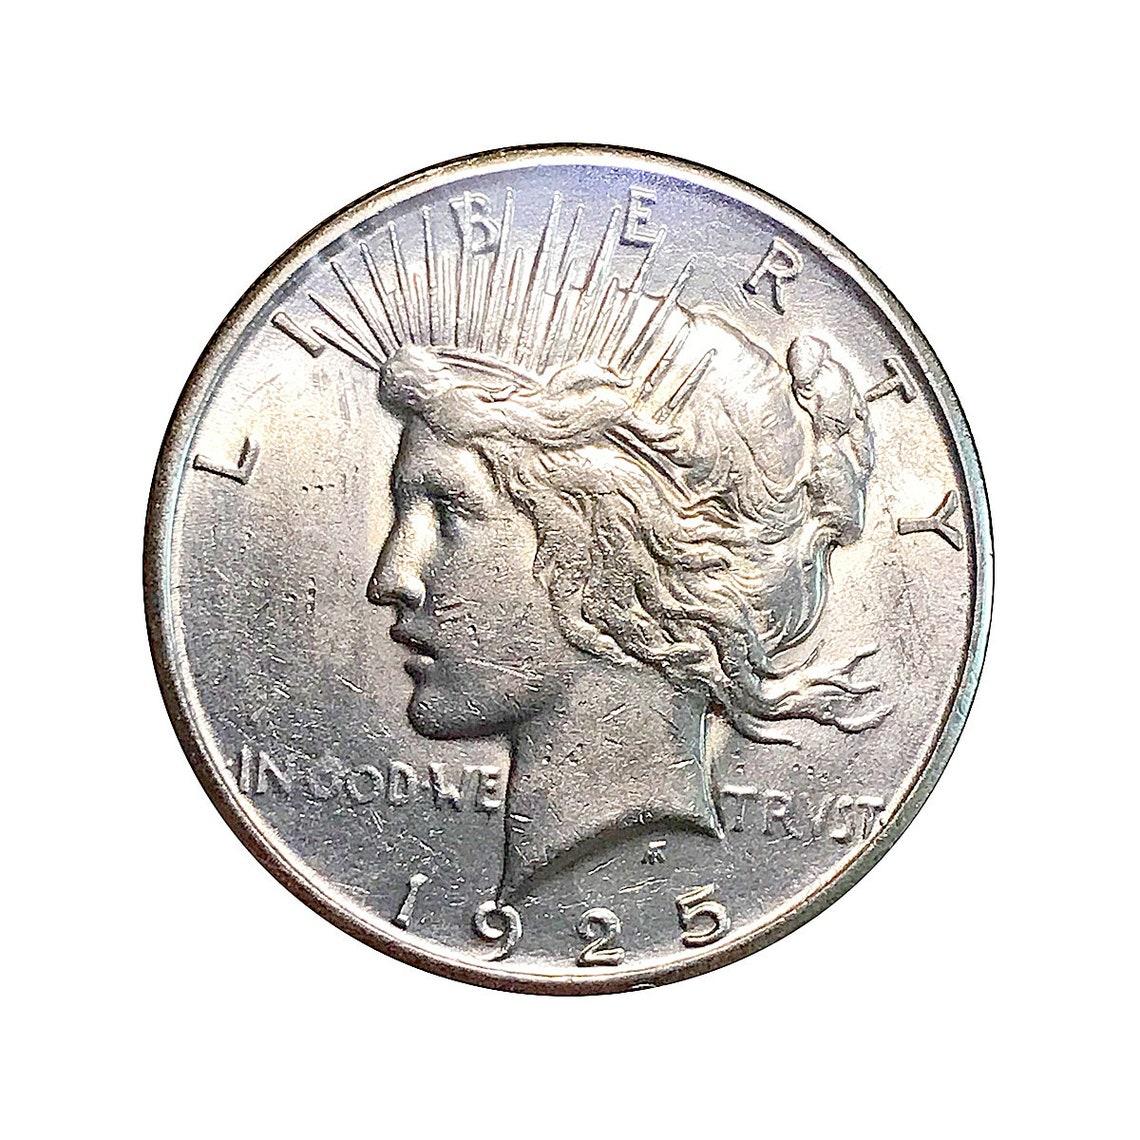 1934 D Peace Dollar AU $1 About Uncirculated